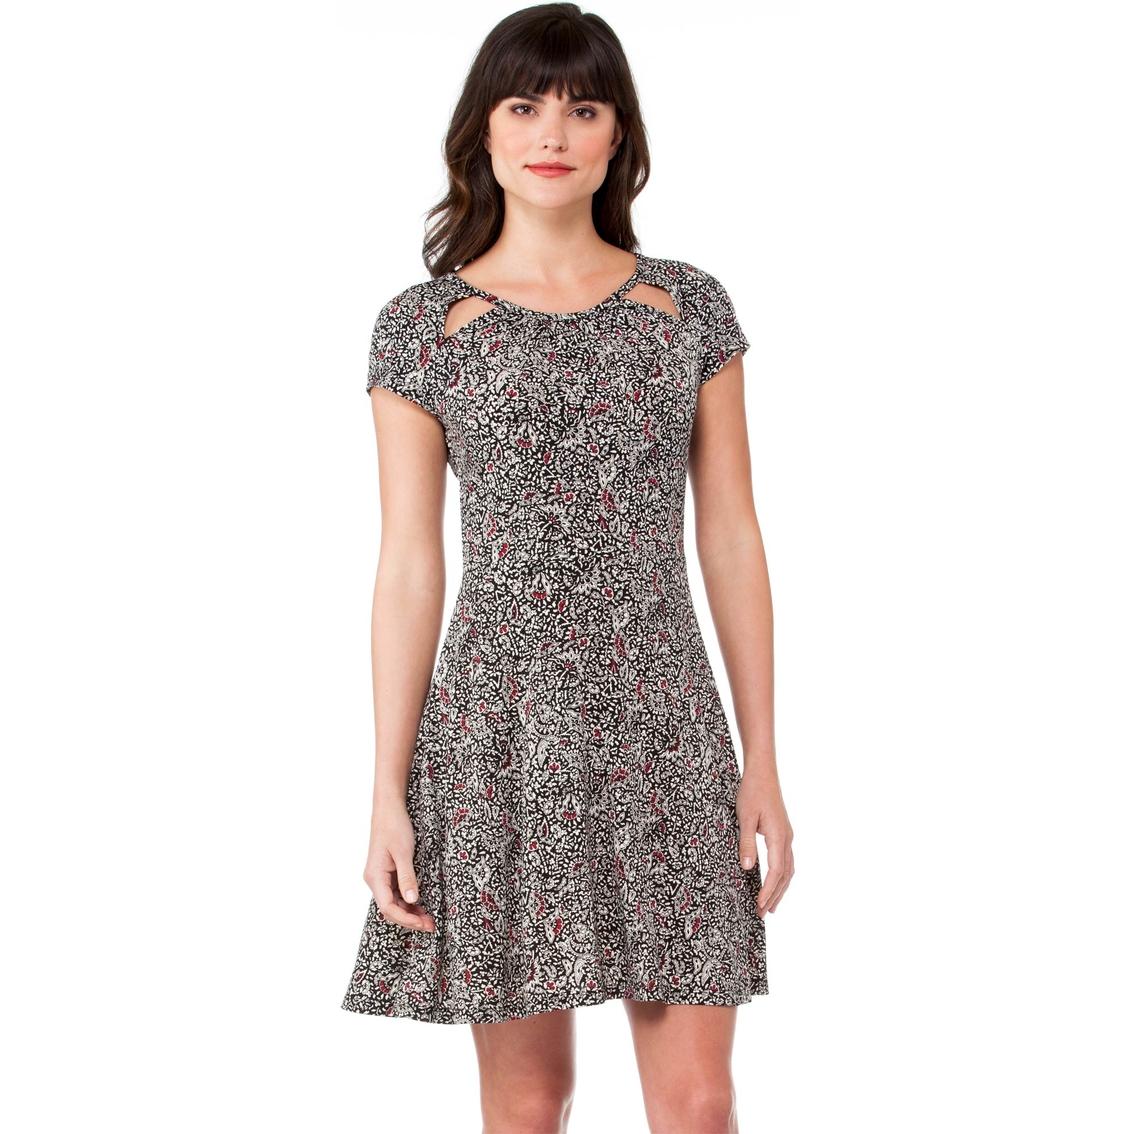 c092c90ef8a Michael Kors Petite Boho Block Print Dress